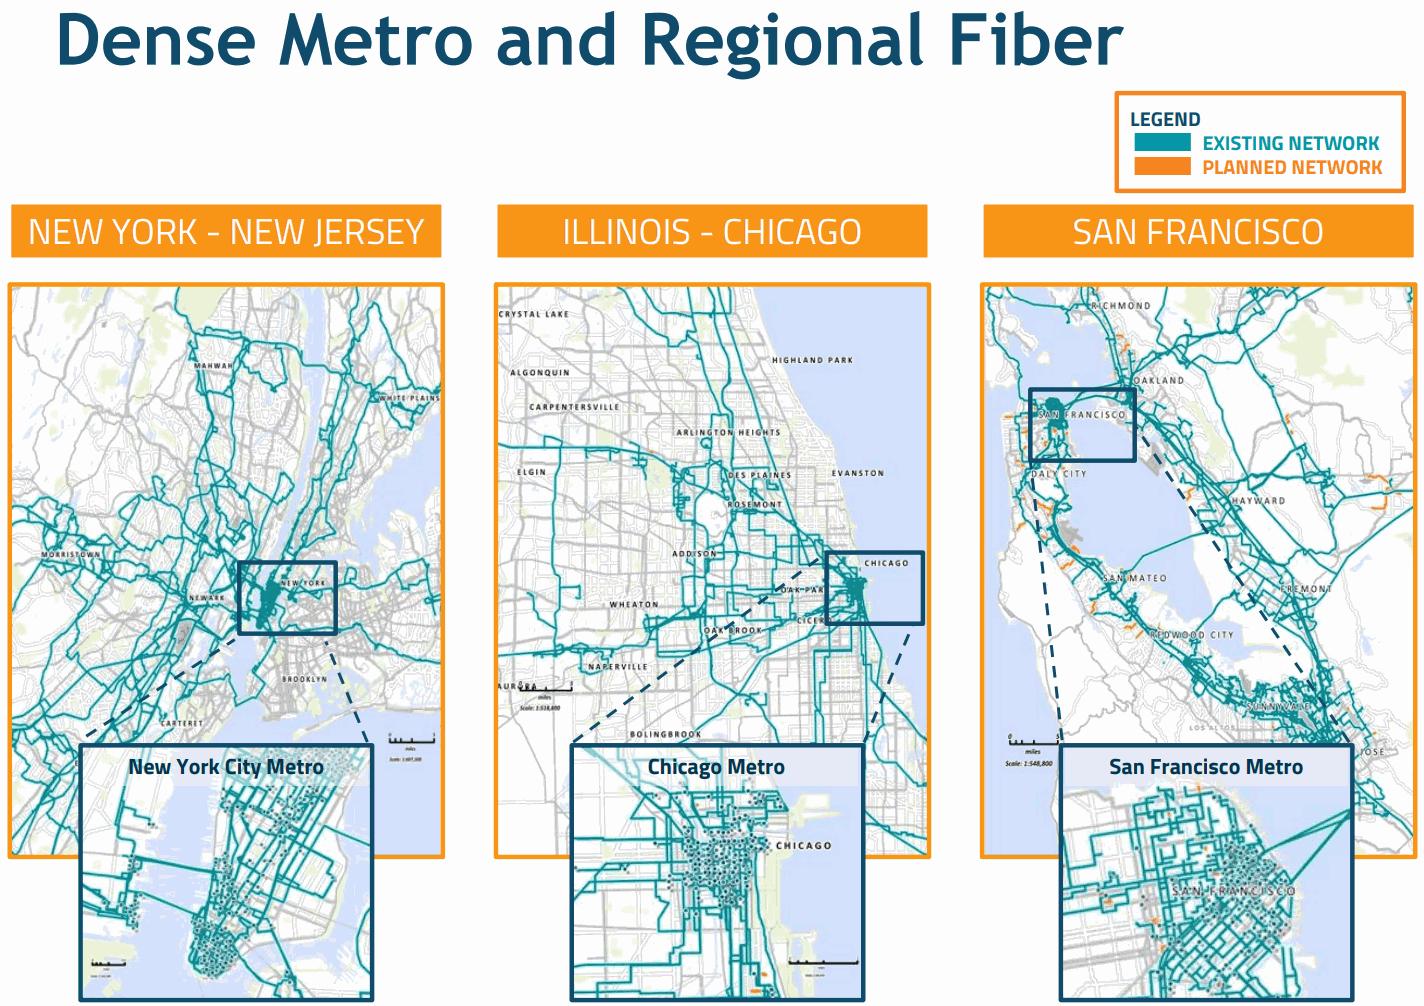 Dense-Metro-and-Regional-Fiber